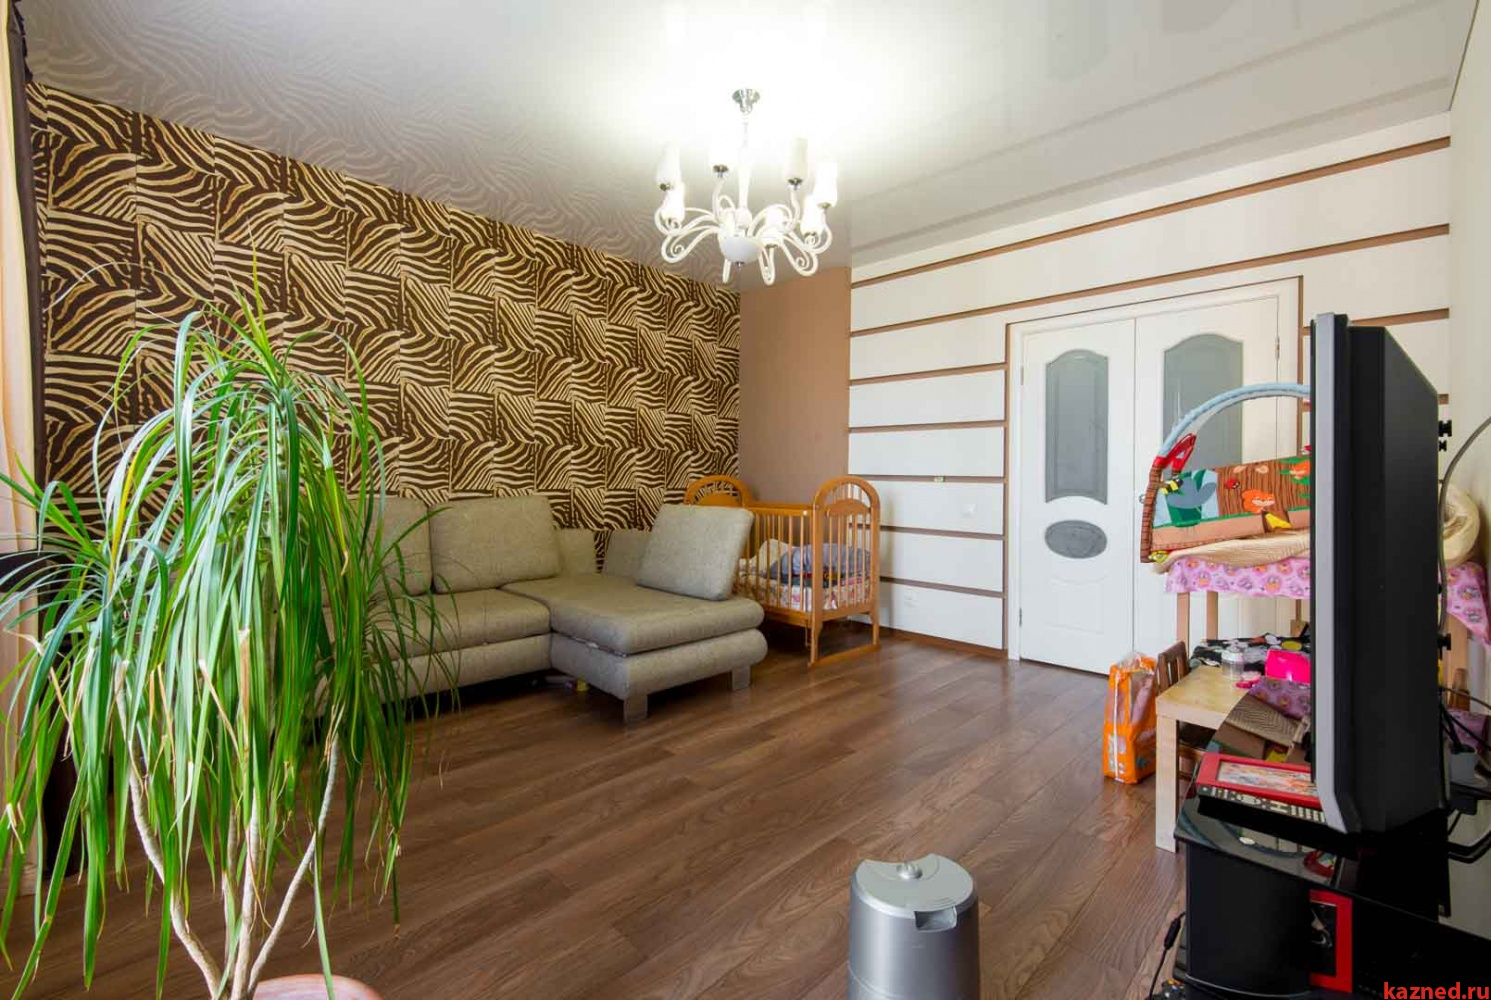 Продажа 3-к квартиры Баки Урманче д.8, 92 м2  (миниатюра №5)